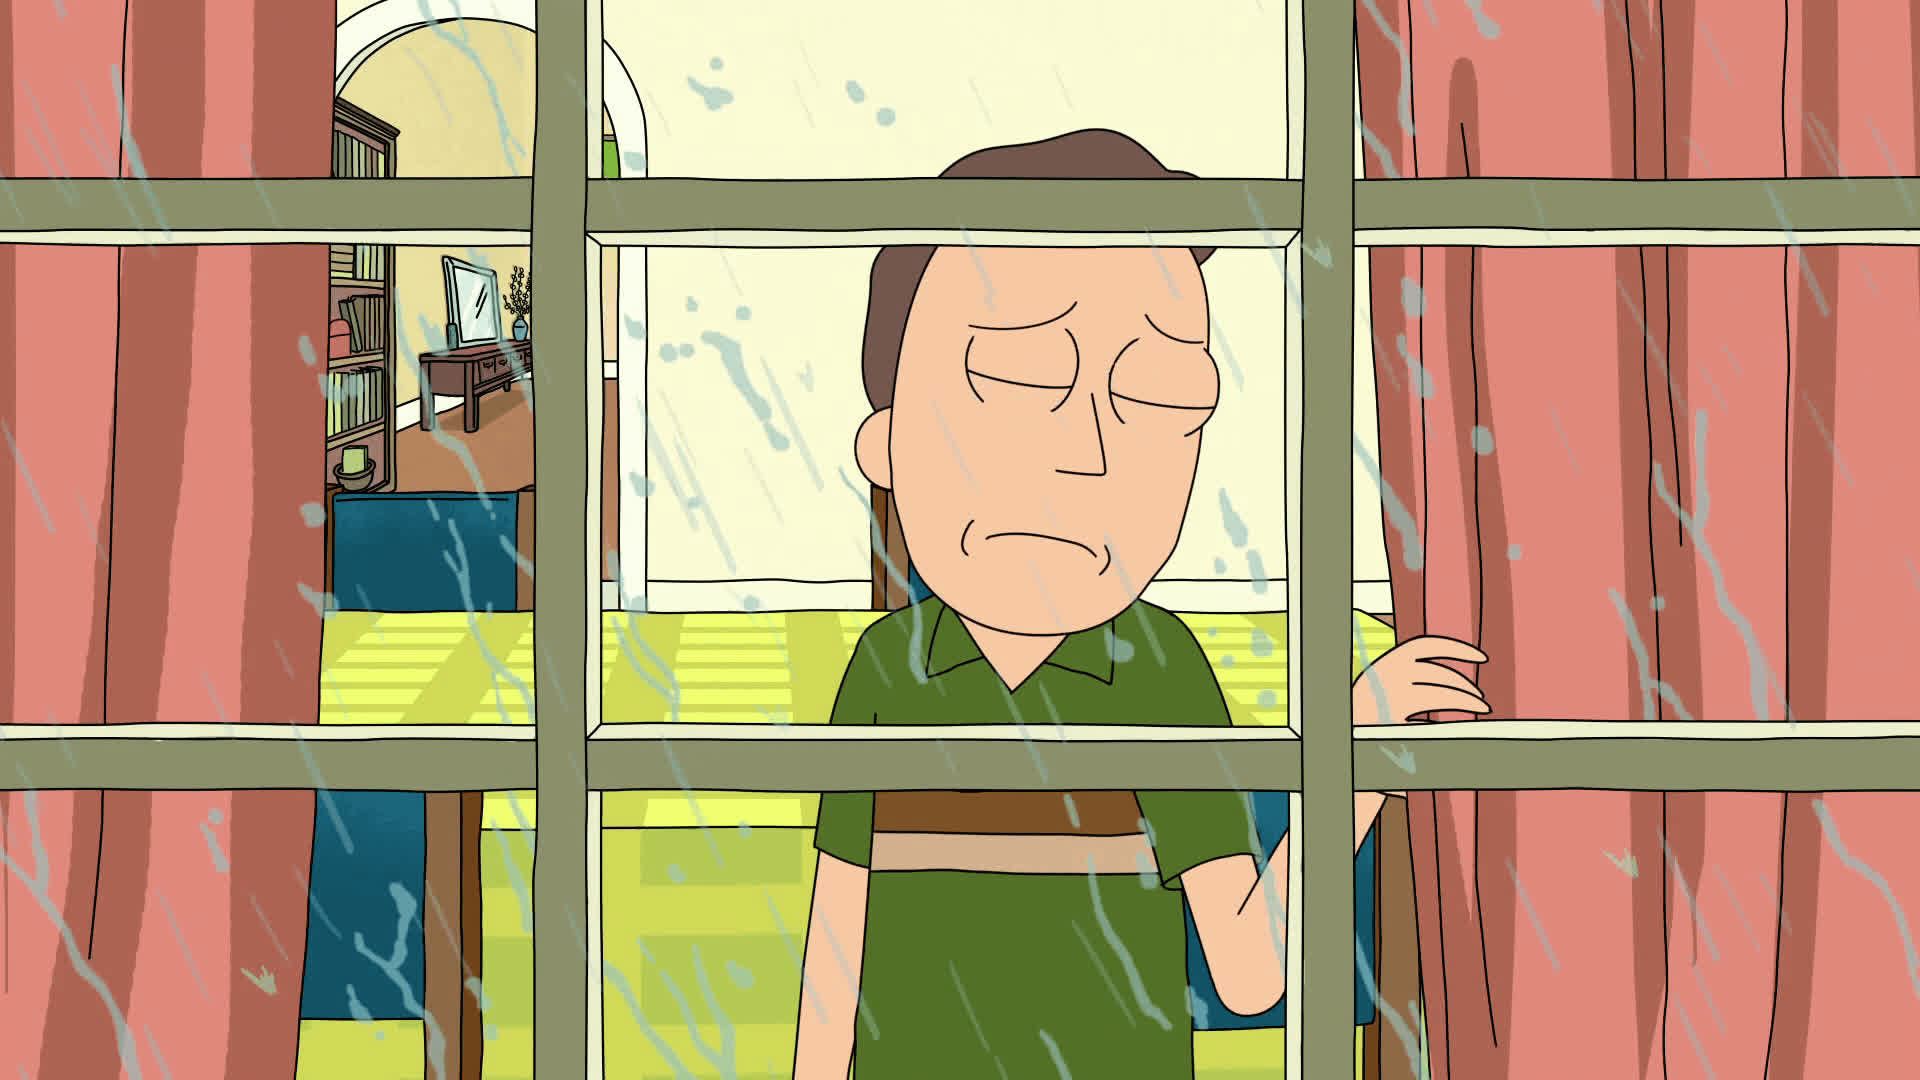 cinemagraph, depressed, jerry, loser, rain, rick and morty, sad, Rick and Morty - Sad Jerry GIFs